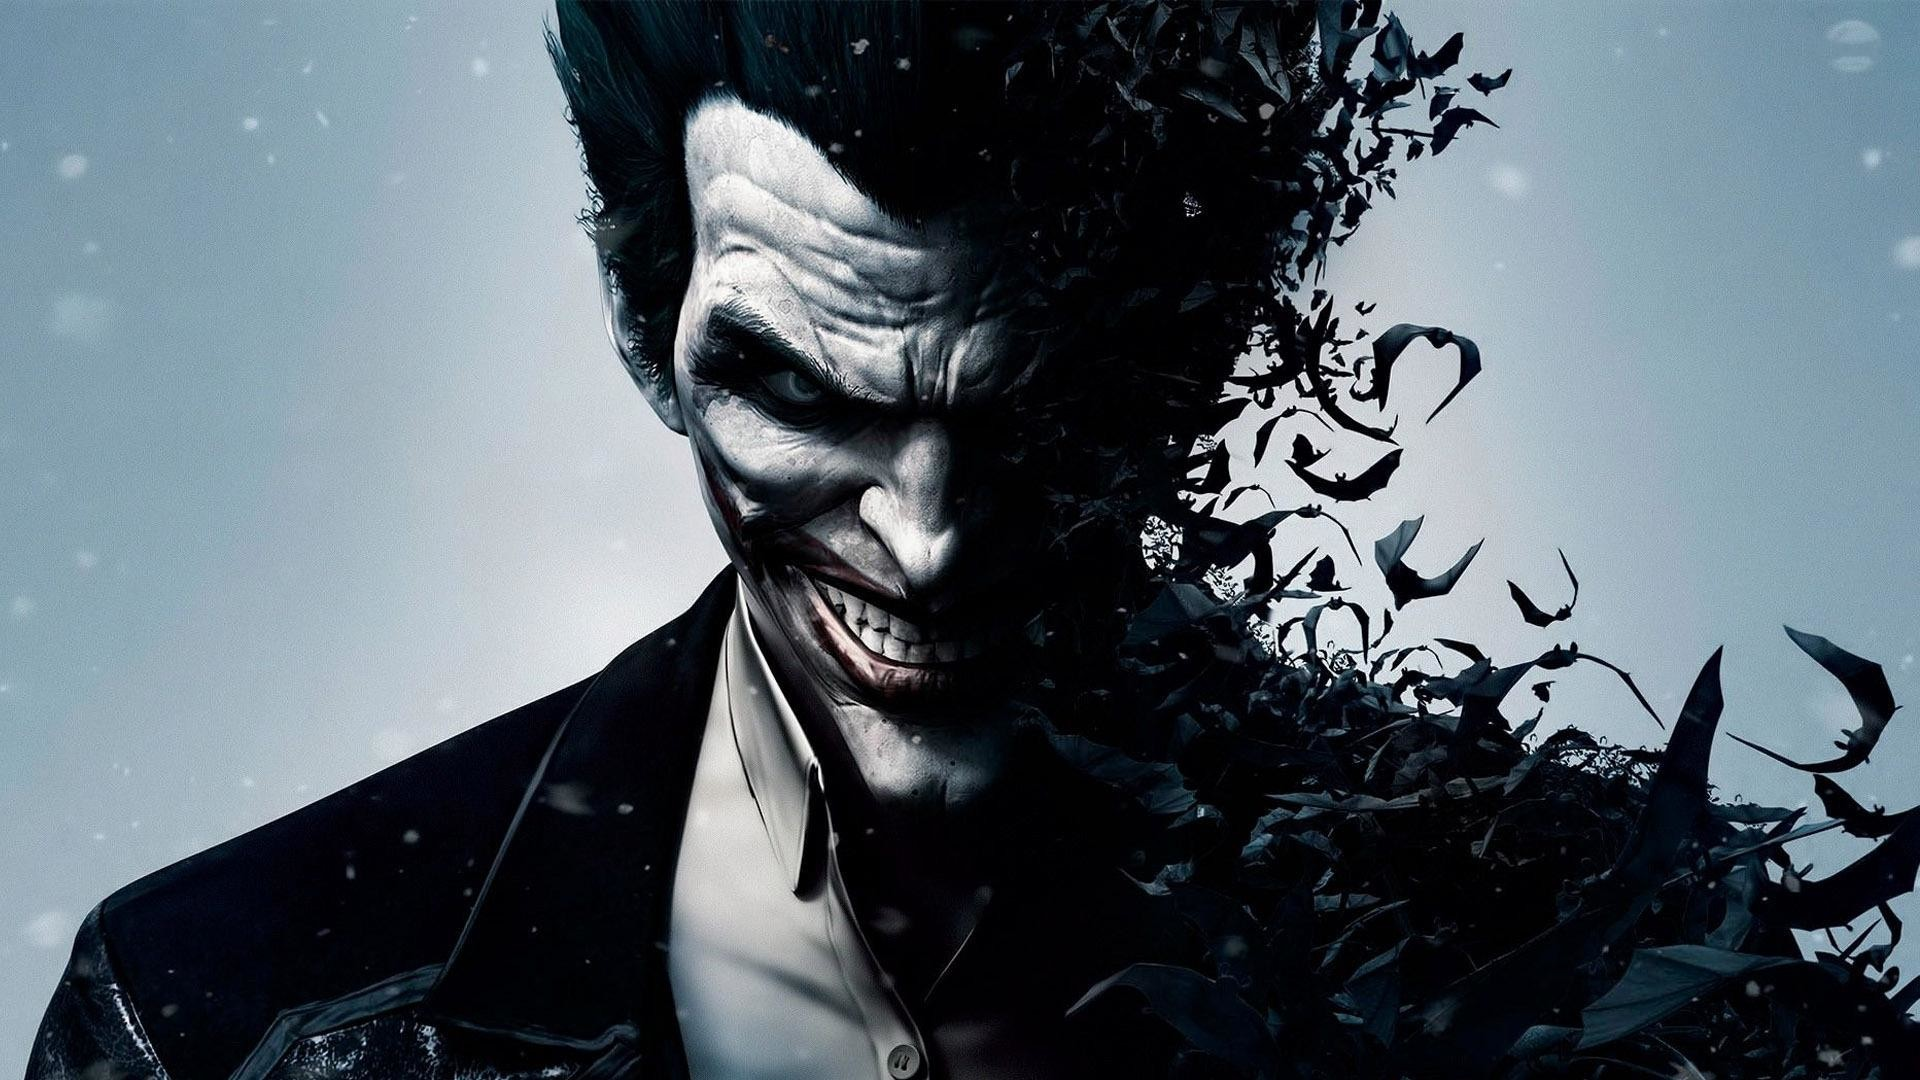 wallpaper.wiki-Joker-1080p-Wallpaper-HD-PIC-WPD004760